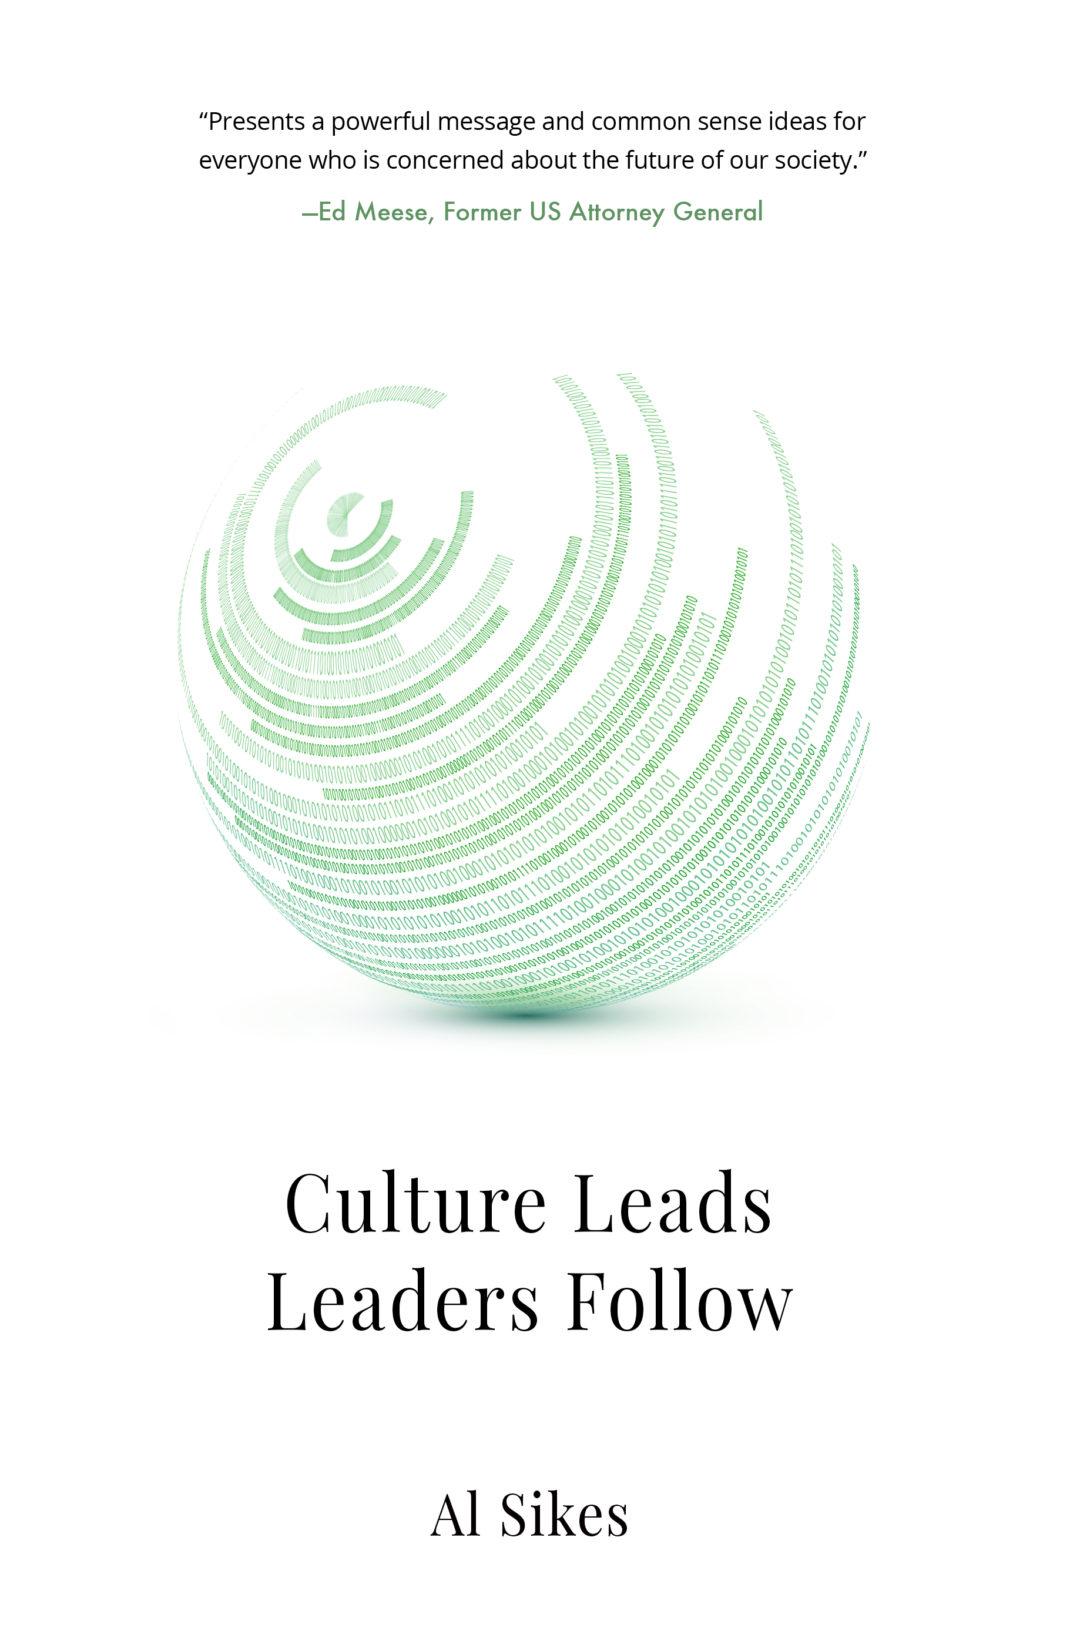 Culture Leads, Leaders Follow